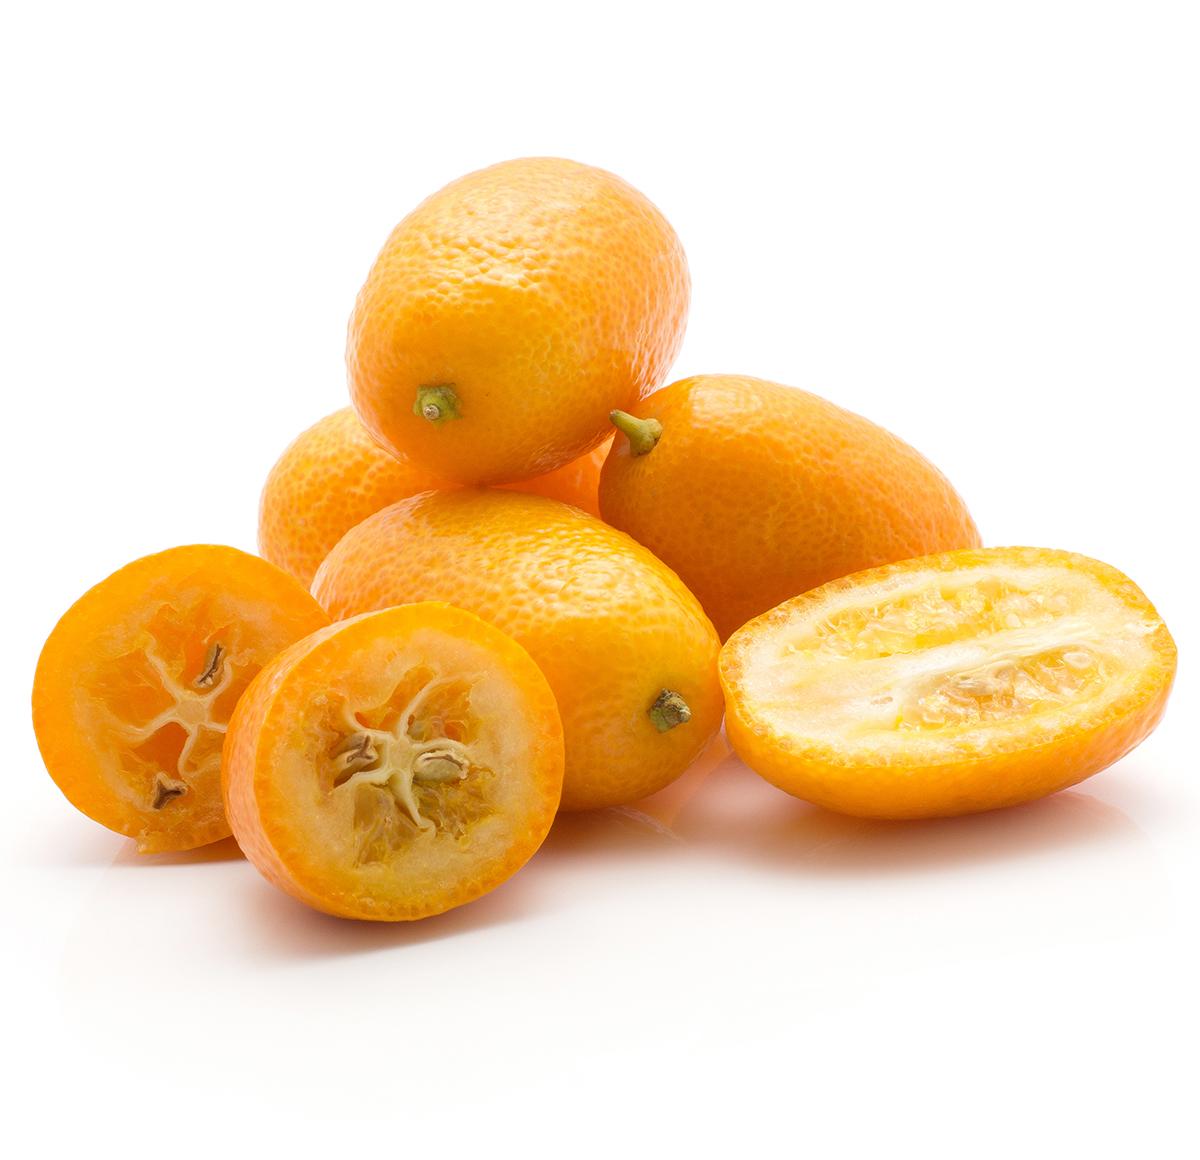 kumquats are always a seasonal fruit favorite